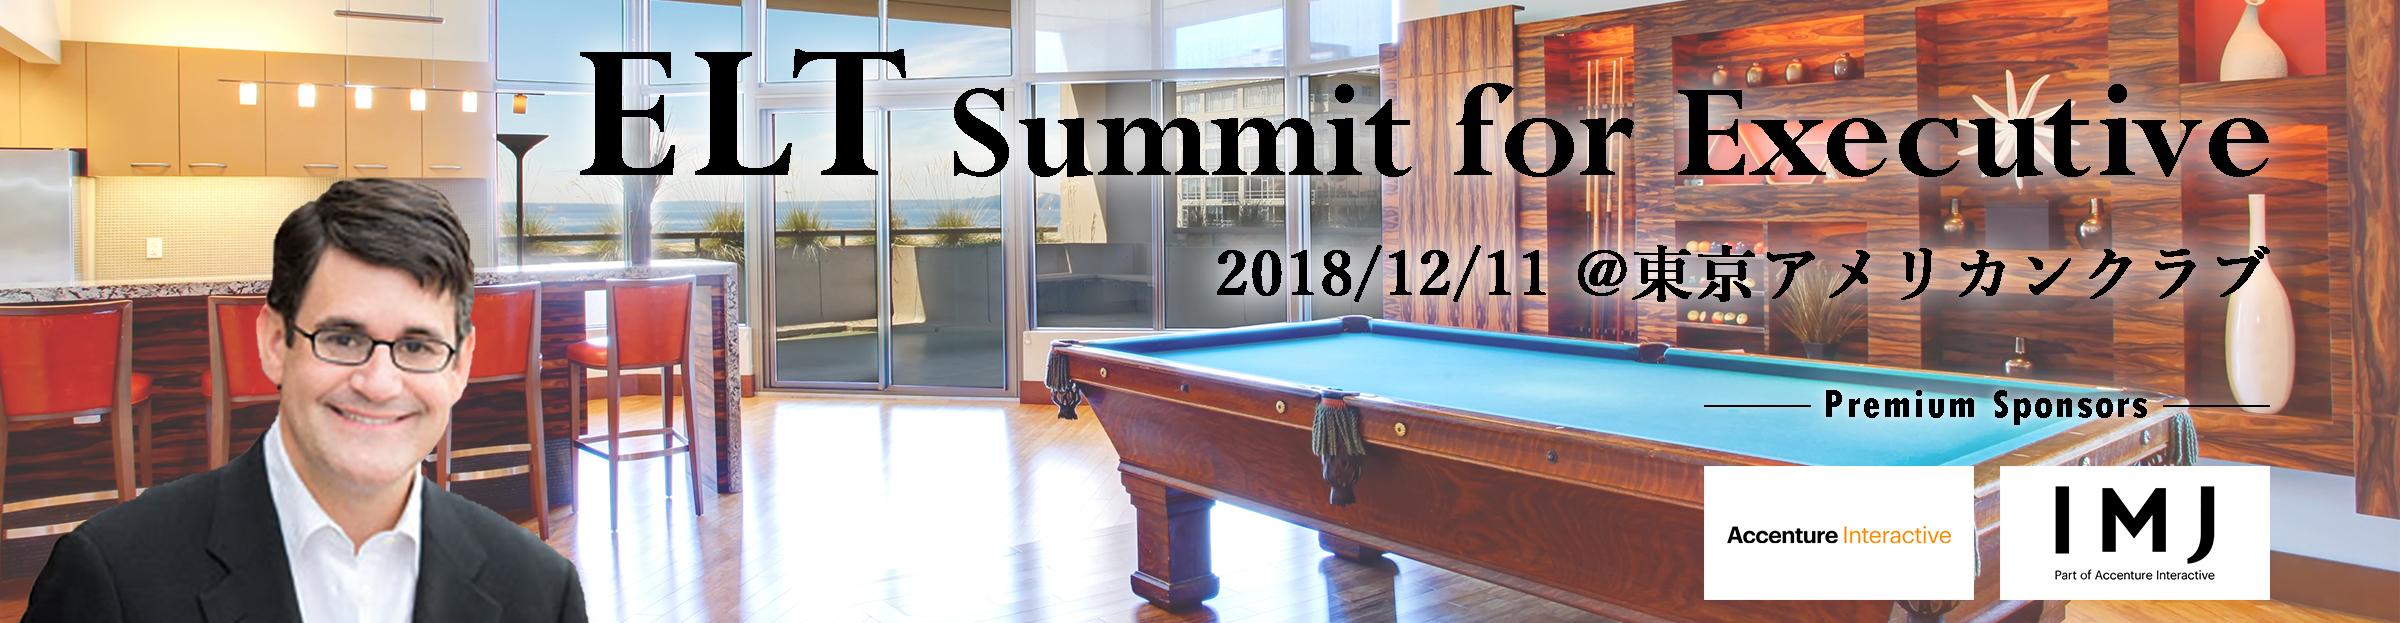 ELT Summit for Executive 企業の意思決定者・エキスパートが一堂に集結し 顧客体験、顧客と企業の接点を中心として @東京アメリカンクラブ 企業変革について学ぶ